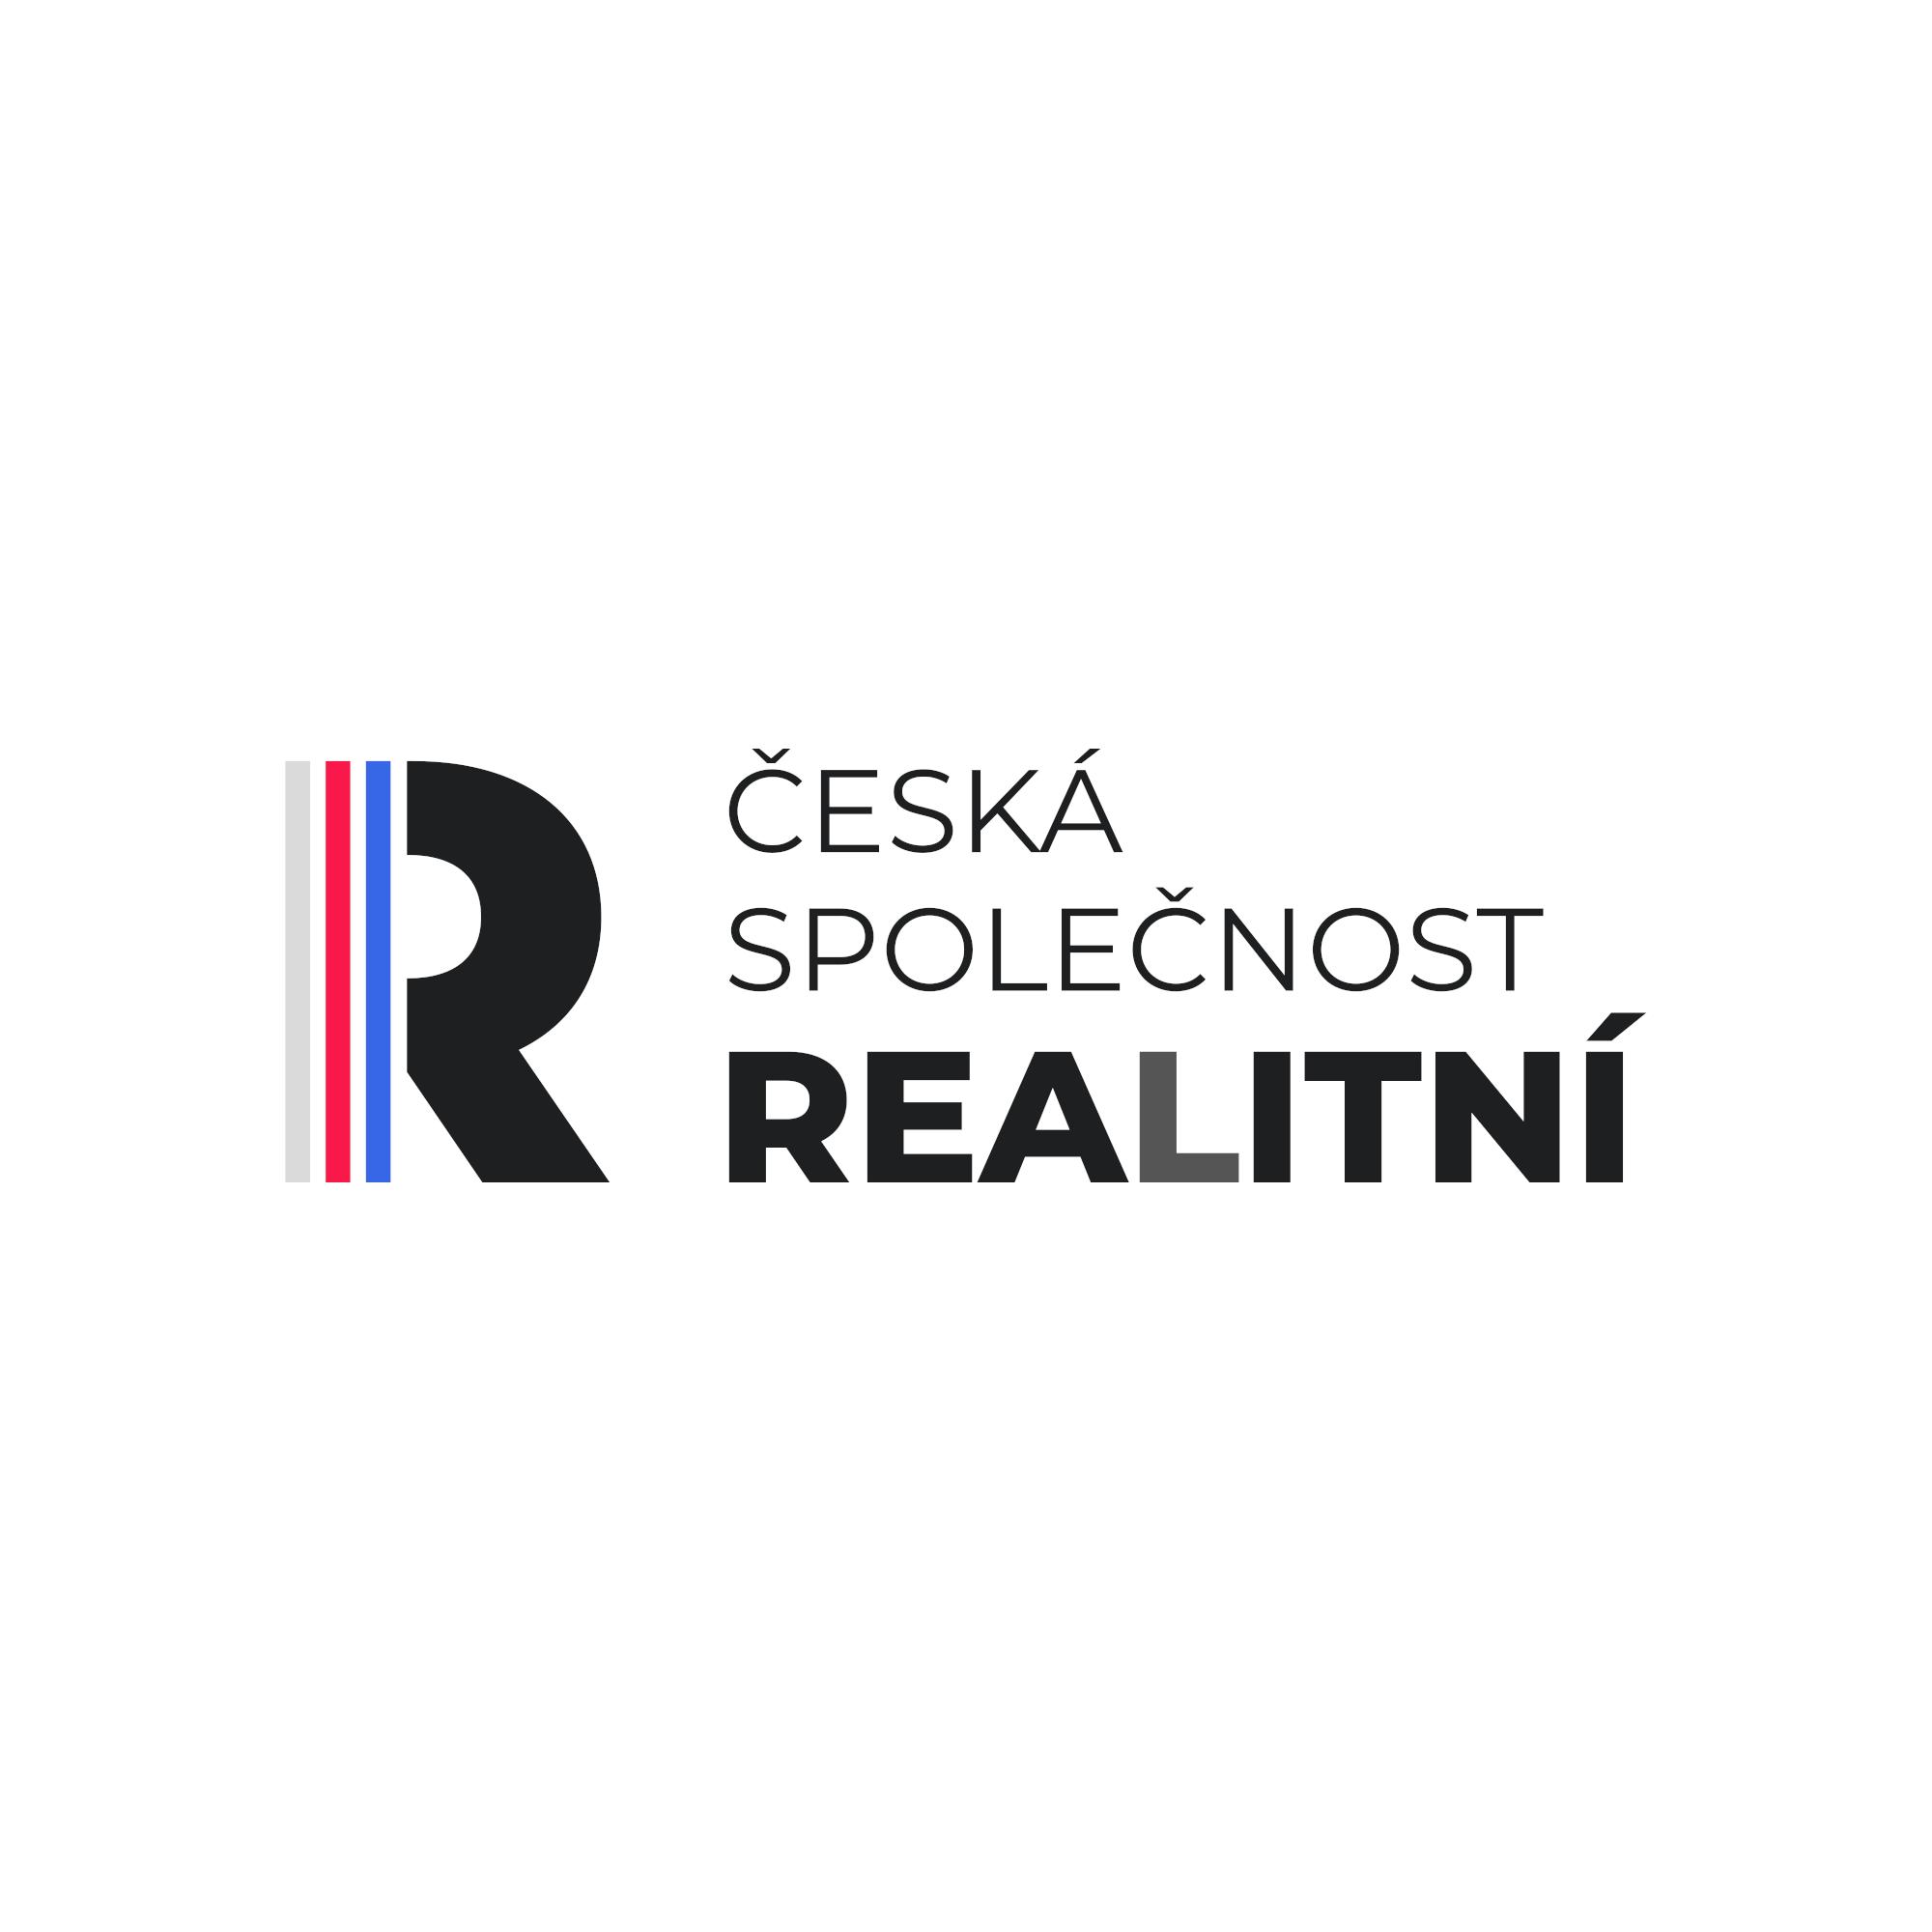 logo-20210110-2000x2000-white-background-1412x449-1.png